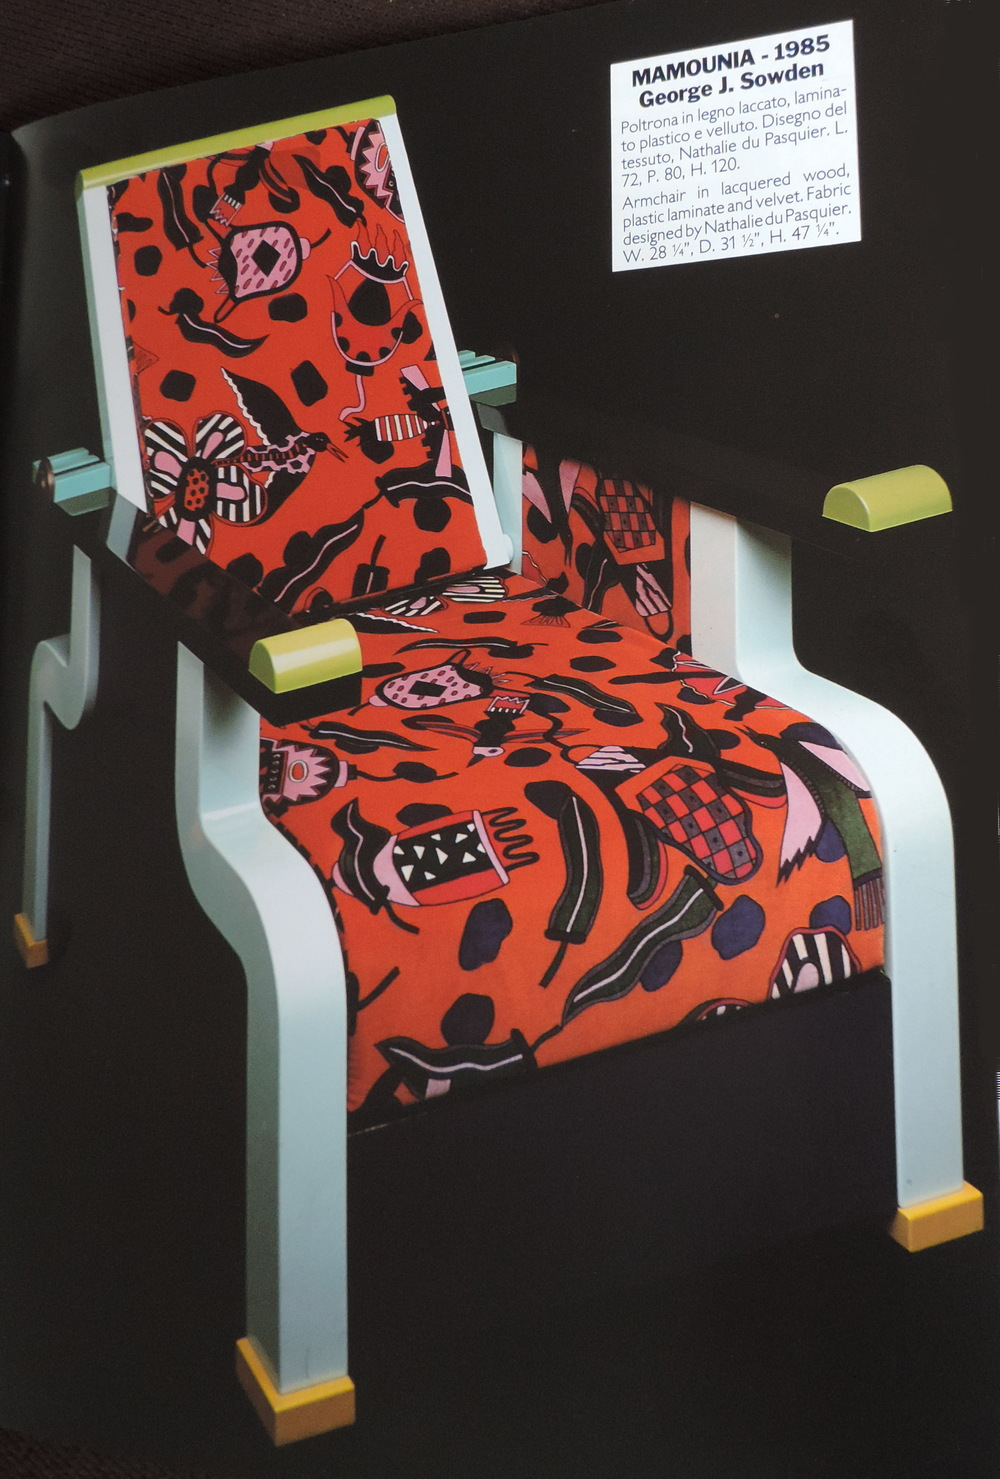 Mamounia Chair for Memphis Milano 1985. Image (c) Memphis Milano 1991